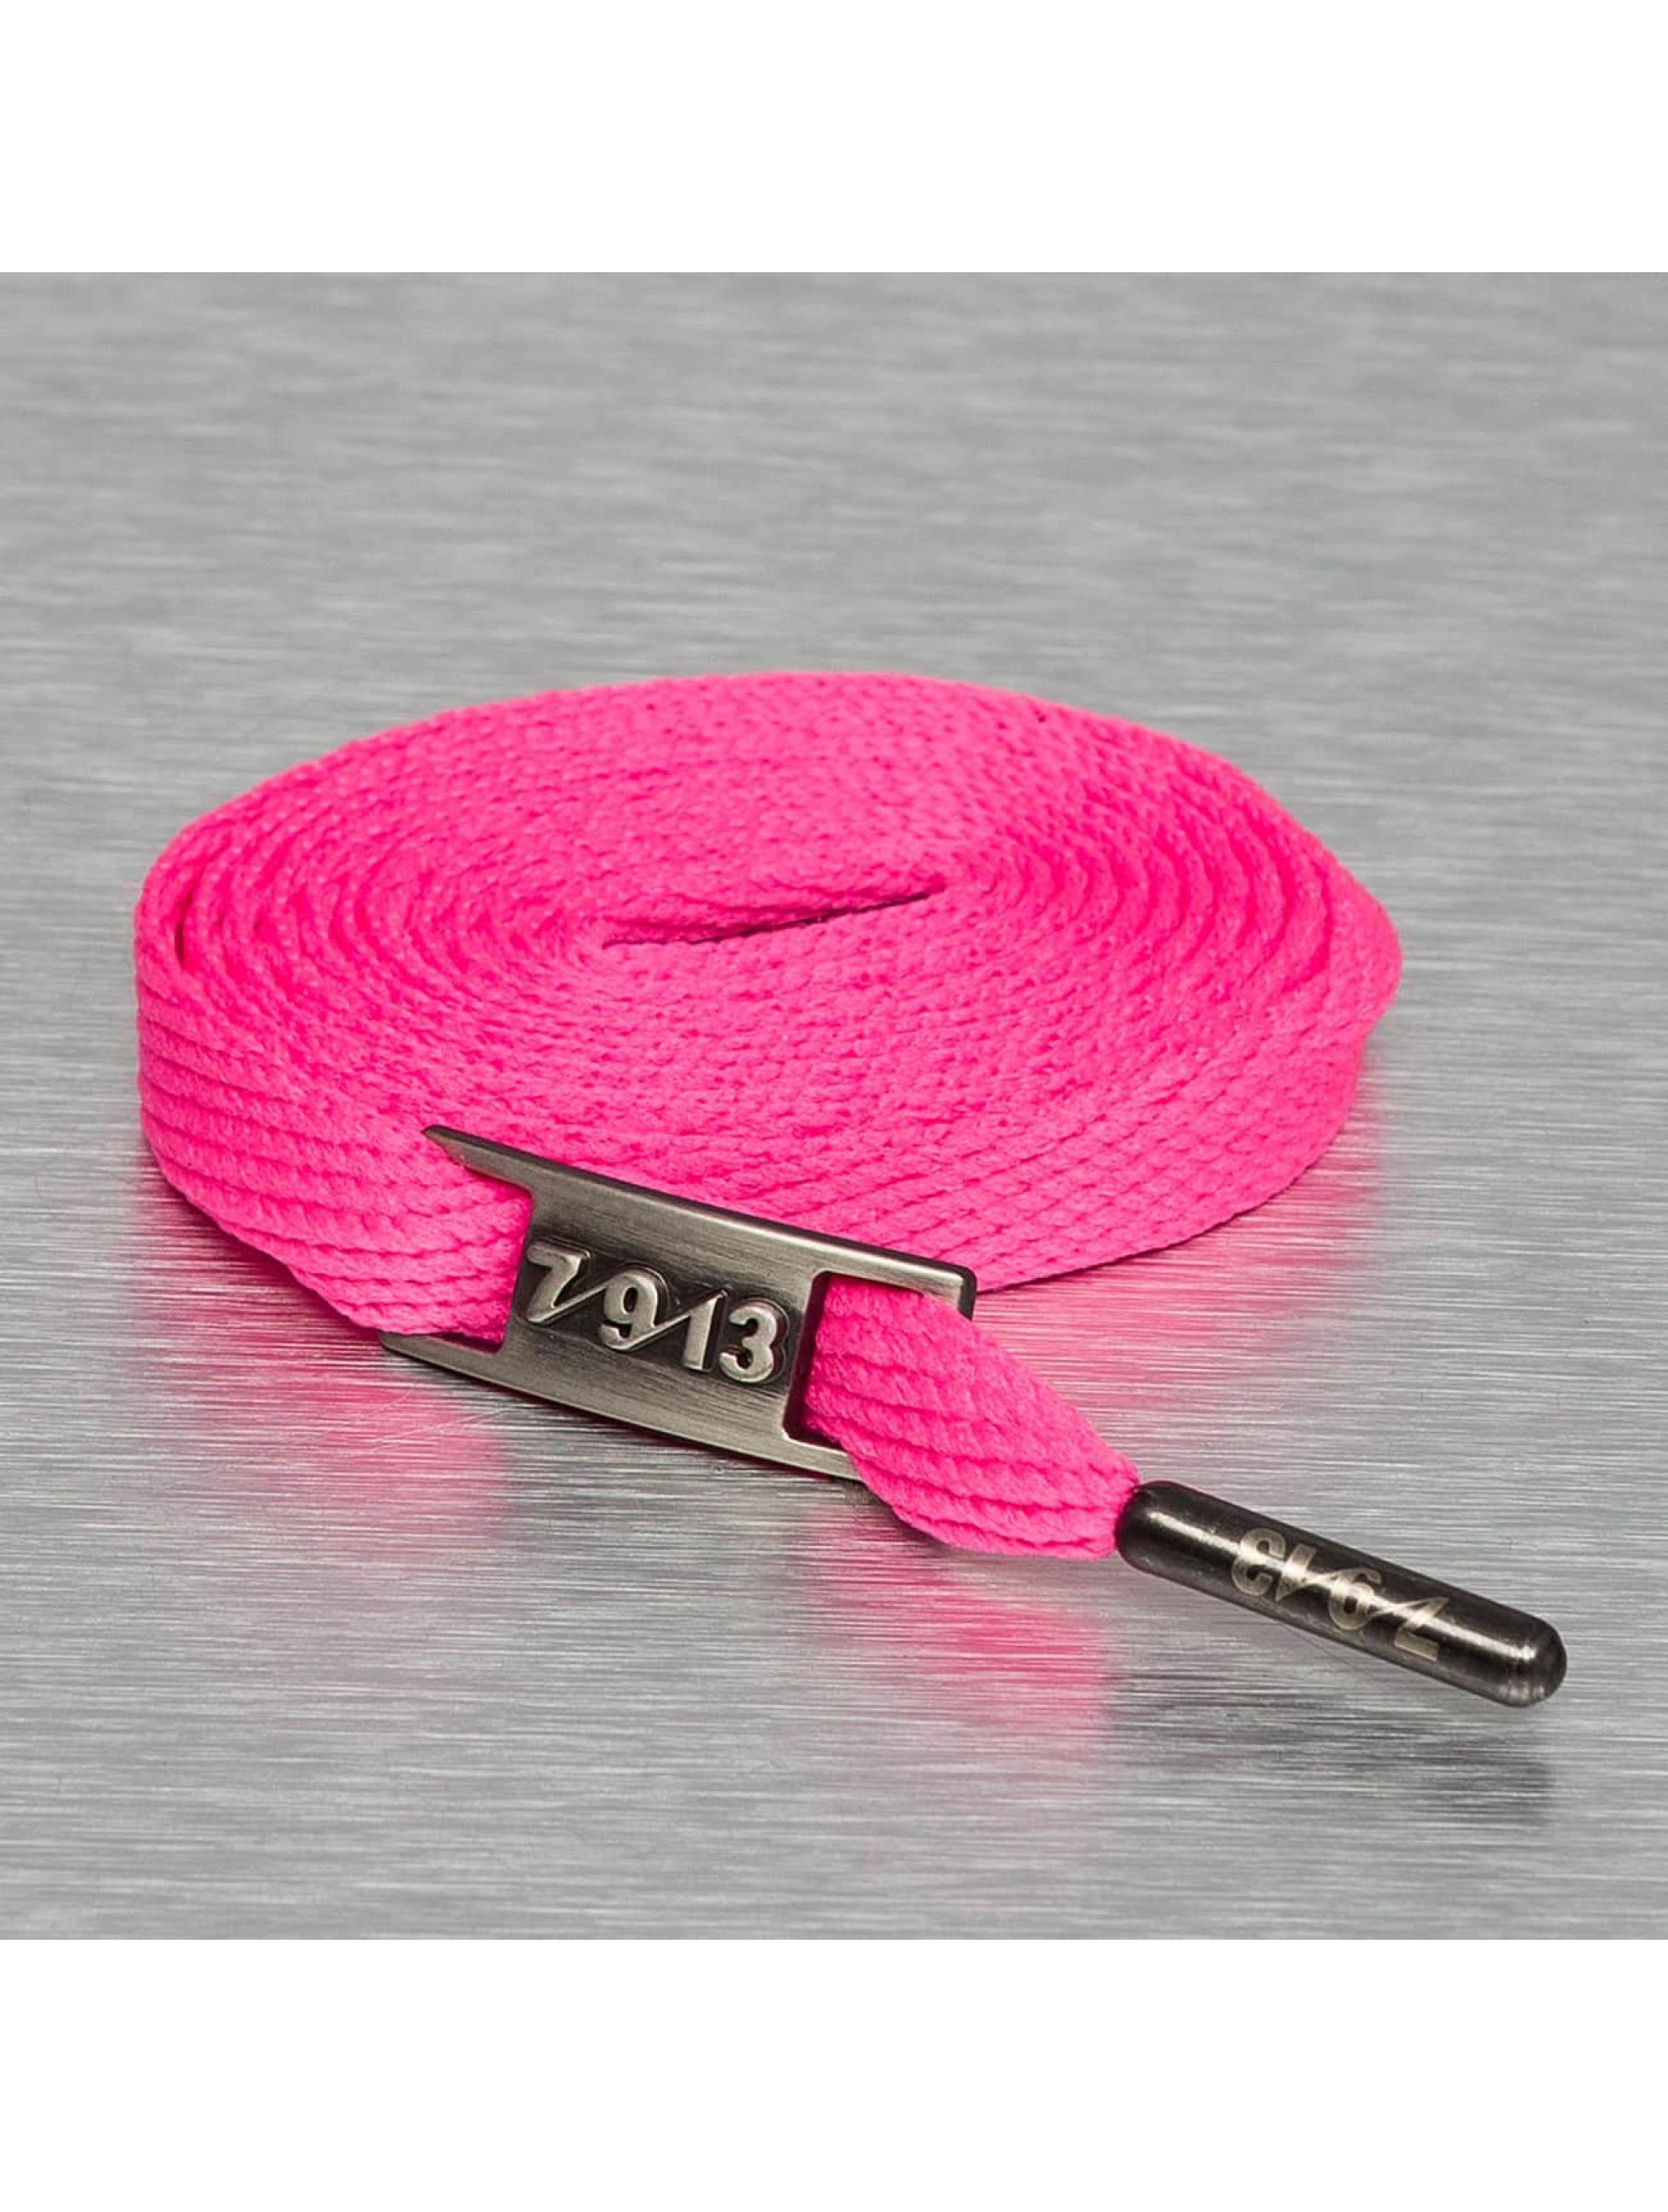 Seven Nine 13 Sznurowadło Full Metal pink